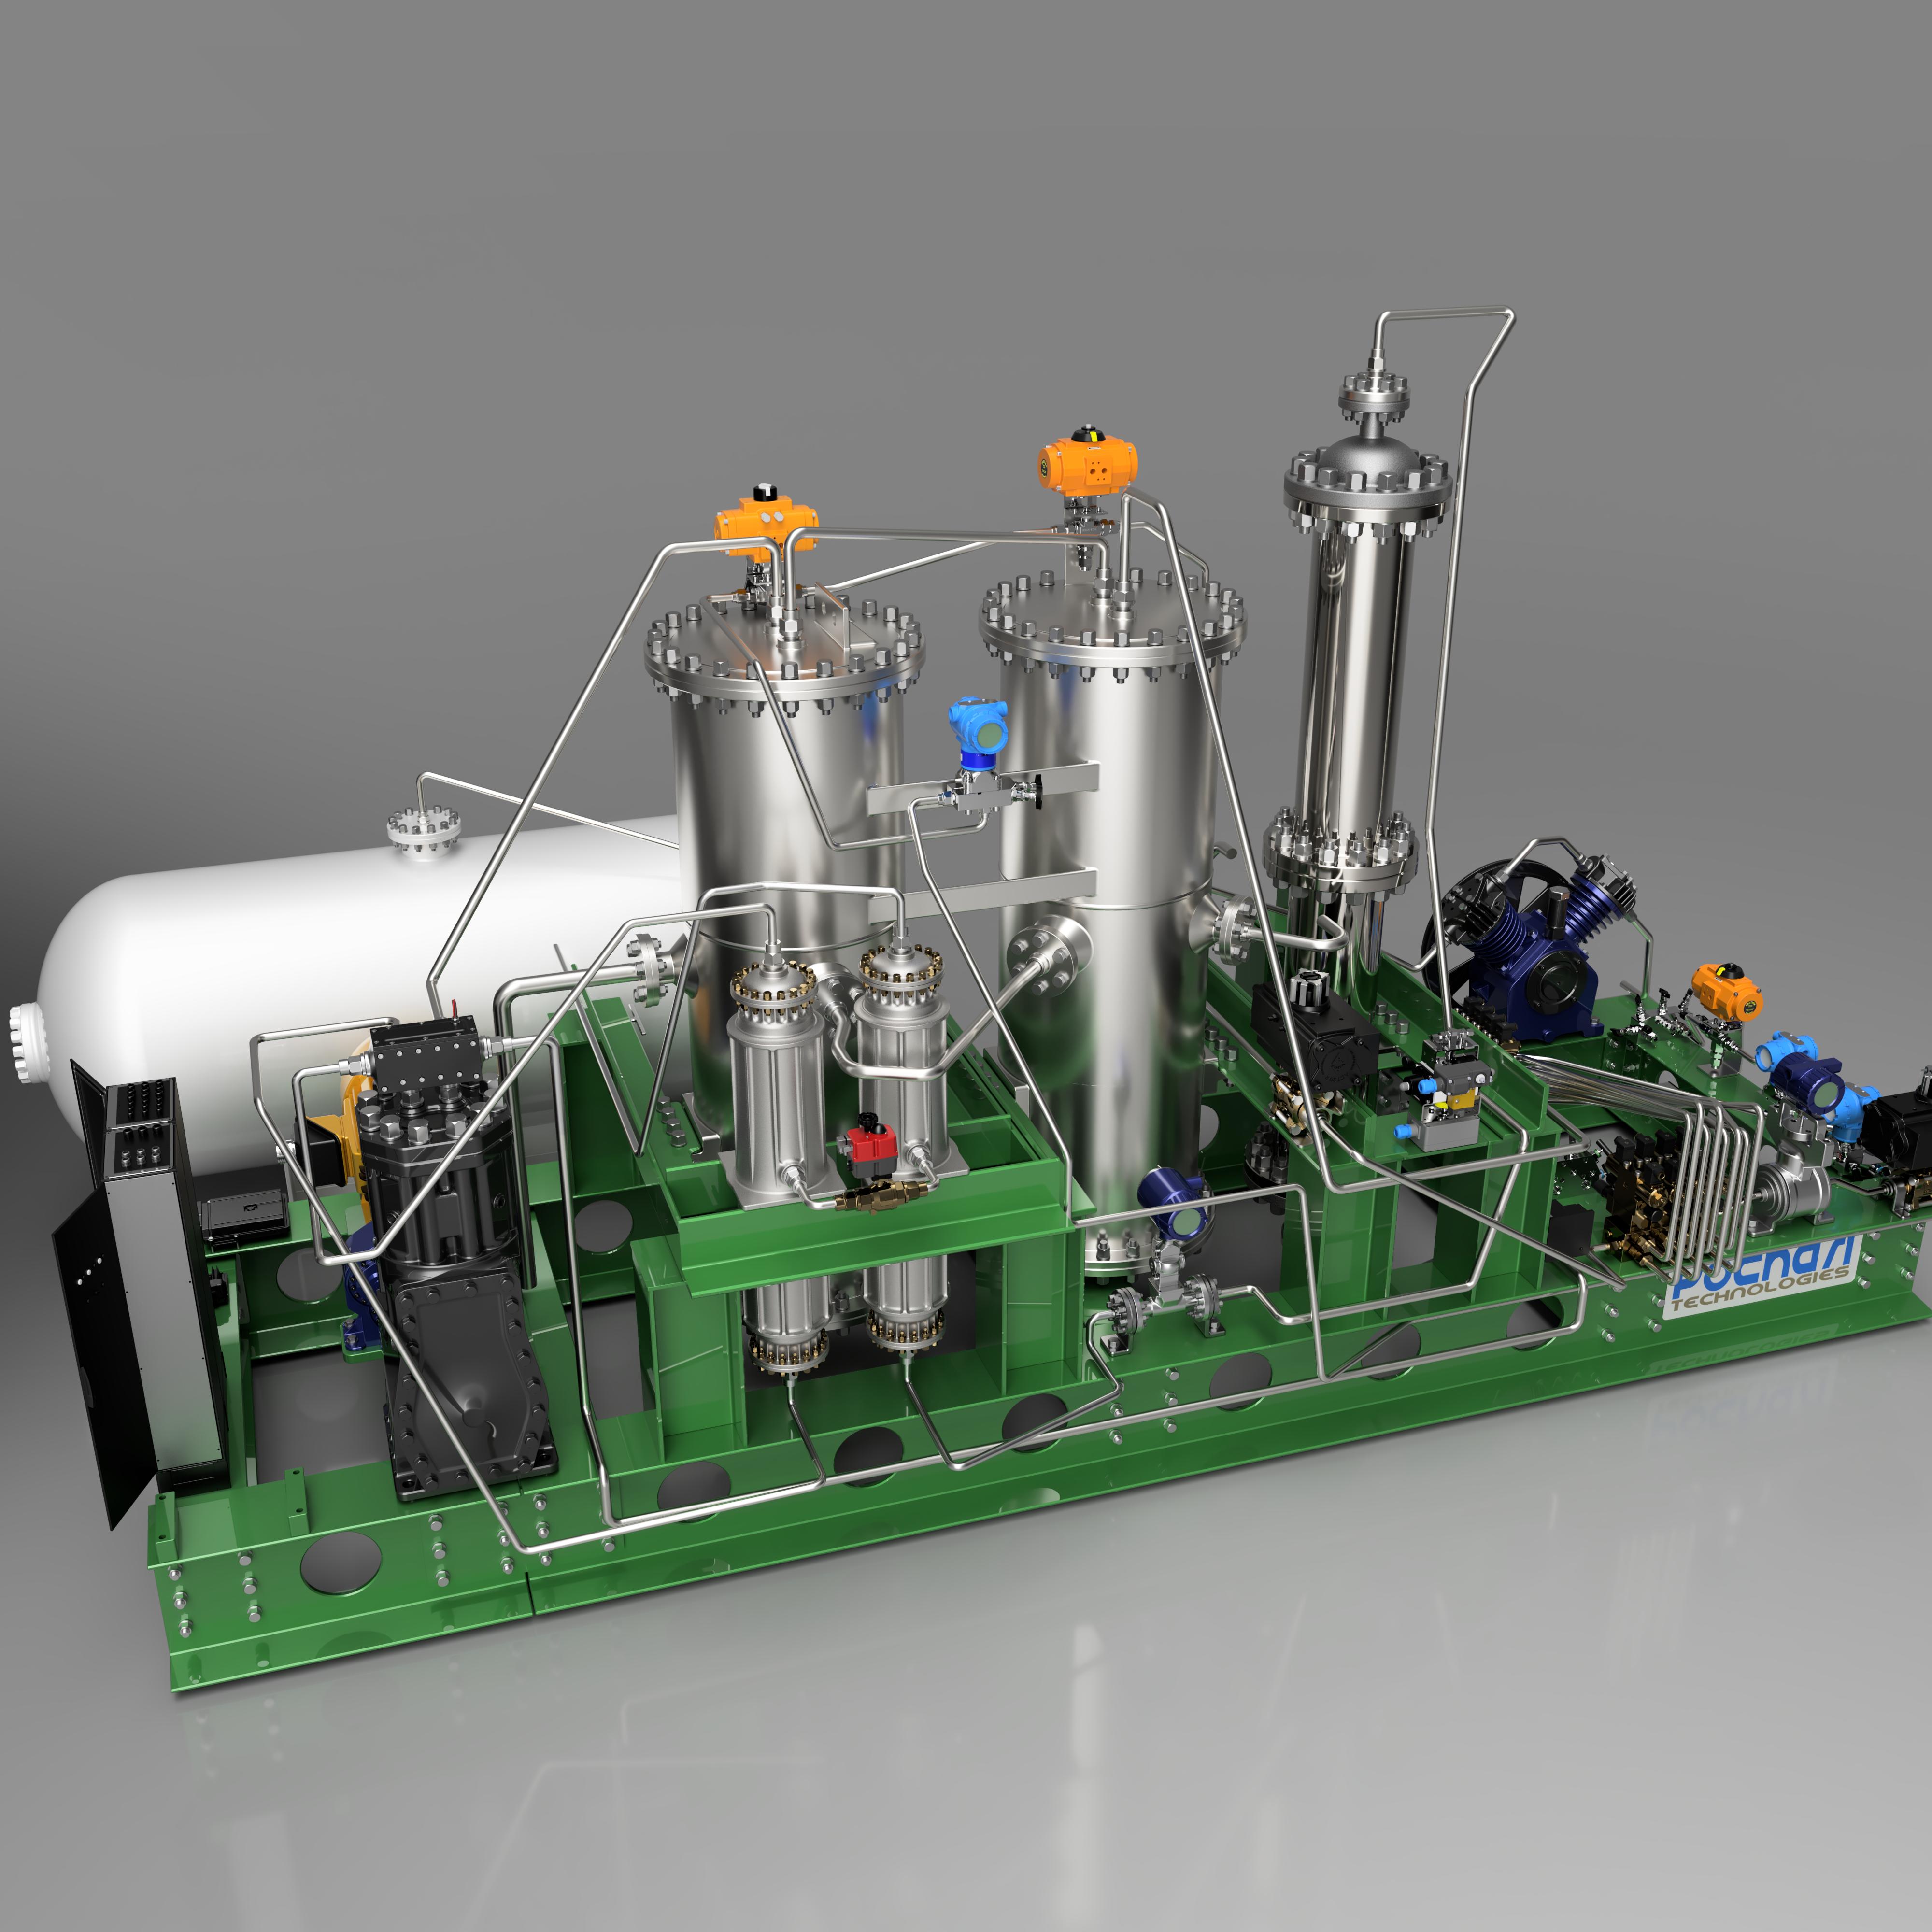 pochari_ammonia_2021-Apr-29_04-25-05AM-000_CustomizedView5516109813